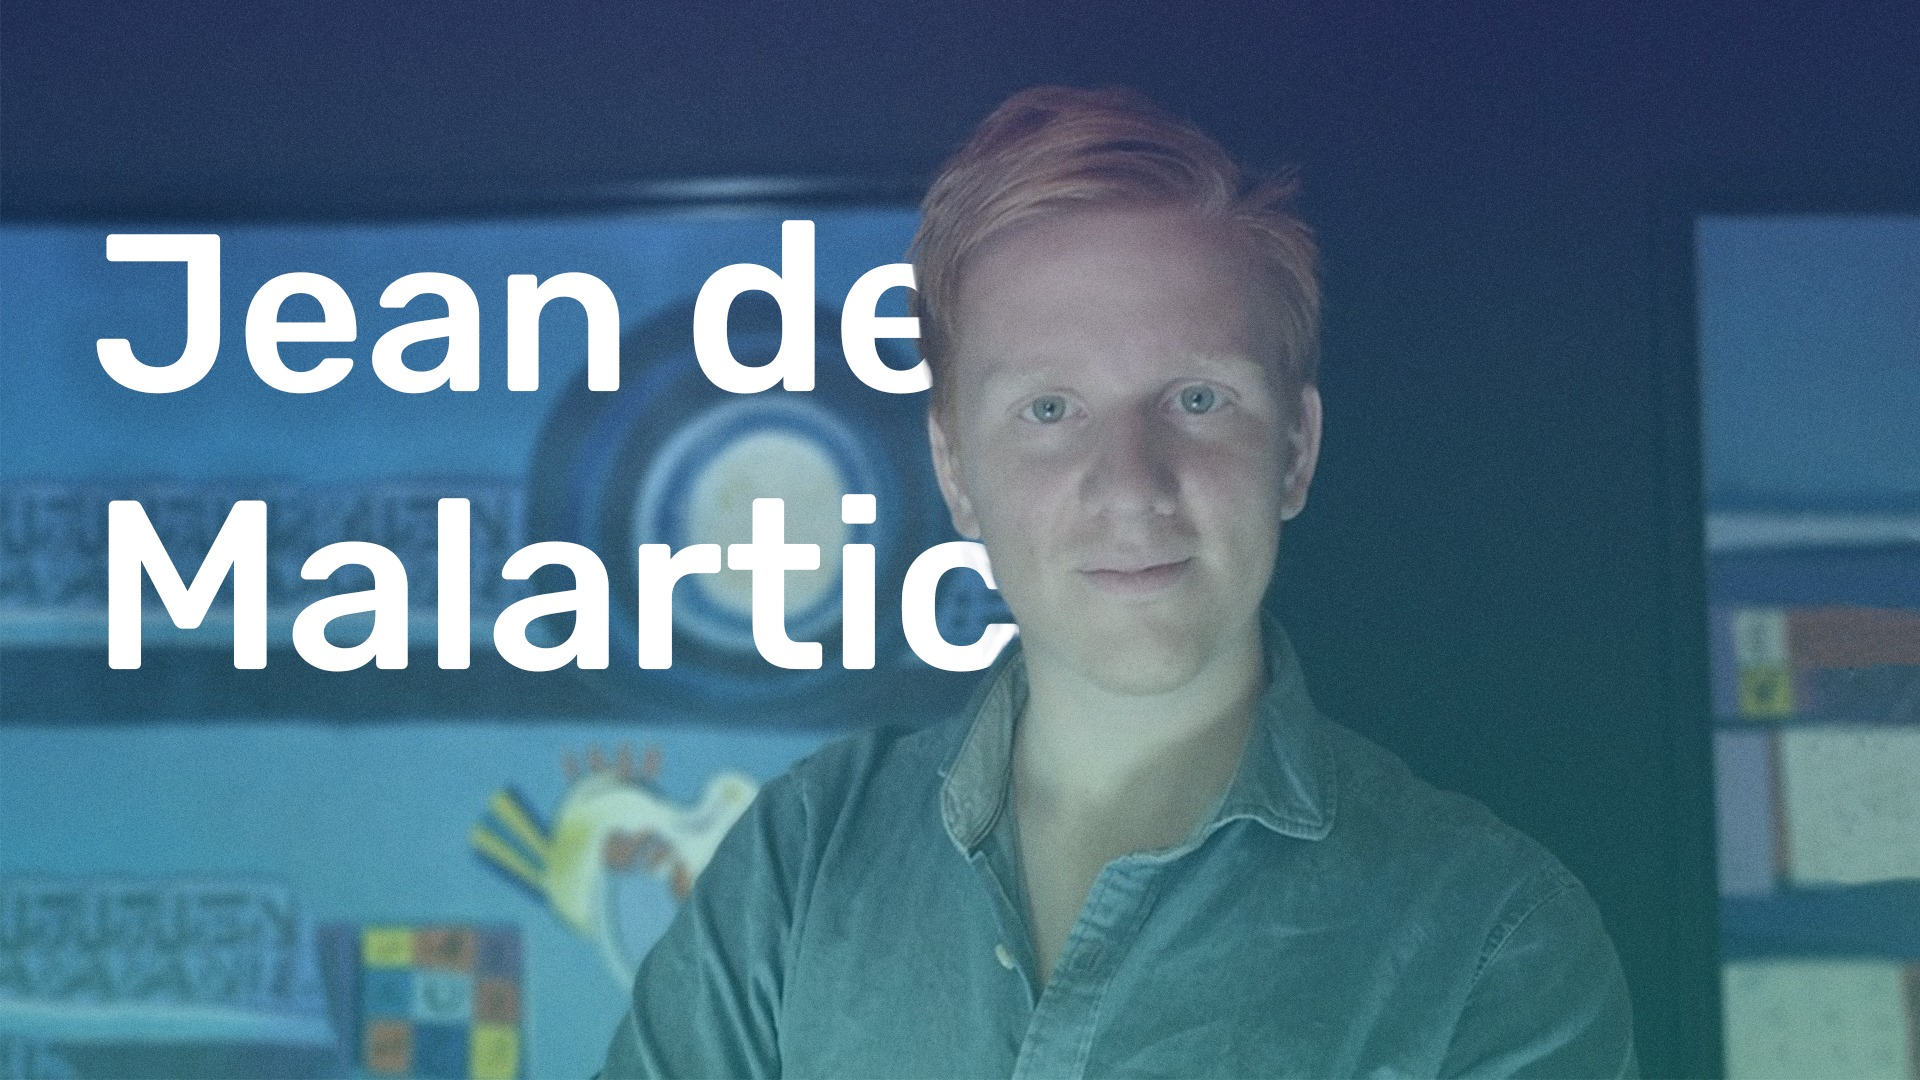 Jean de Malartic